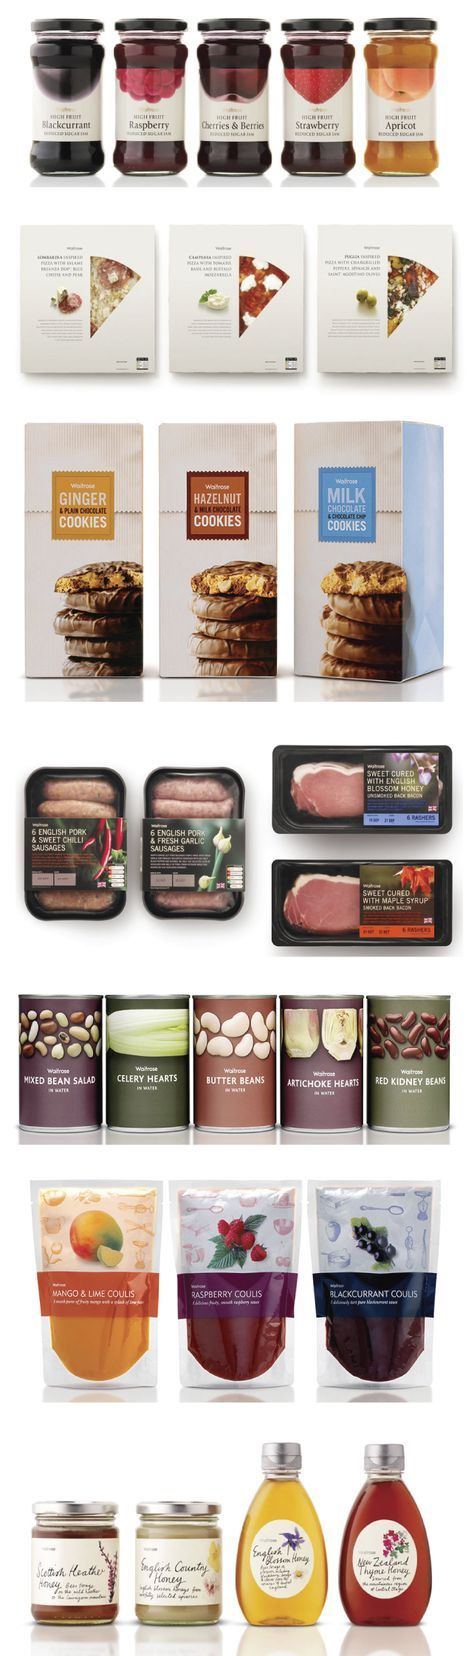 Waitrose UK - Turner Duckworth. Awesome #privatelabel #packaging system PD